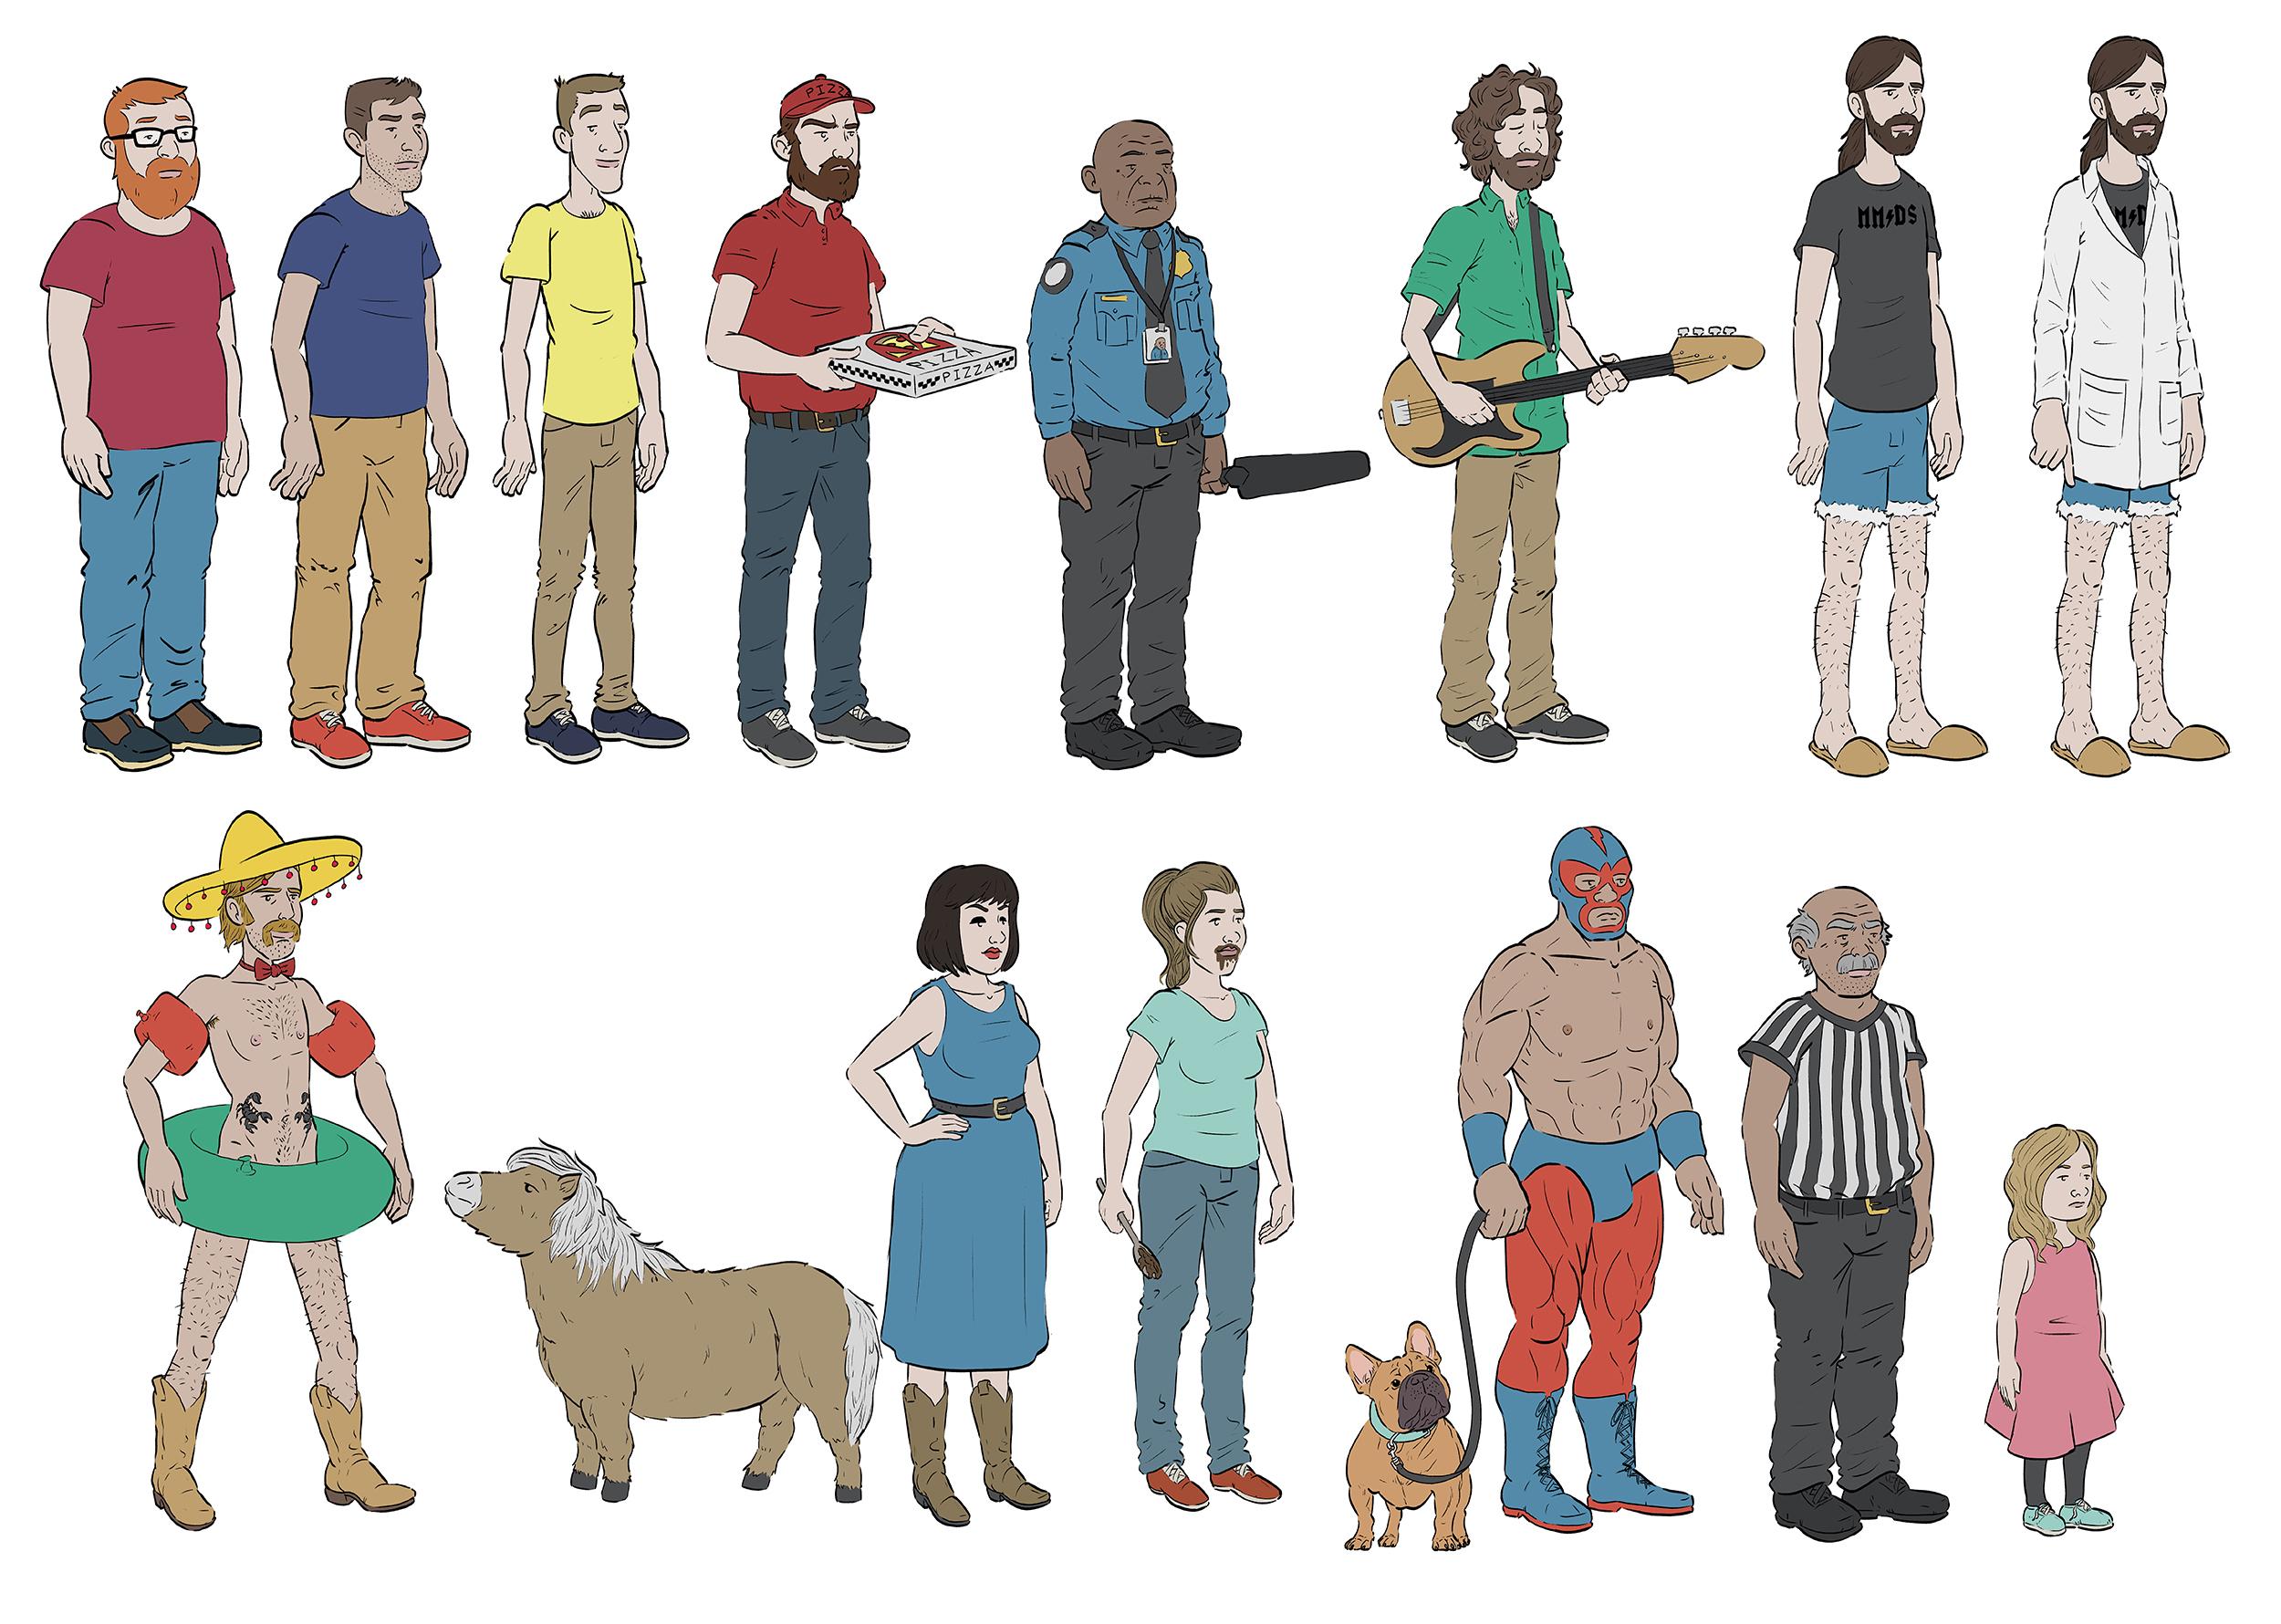 Grogheads_Character_Lineup_v6.jpg